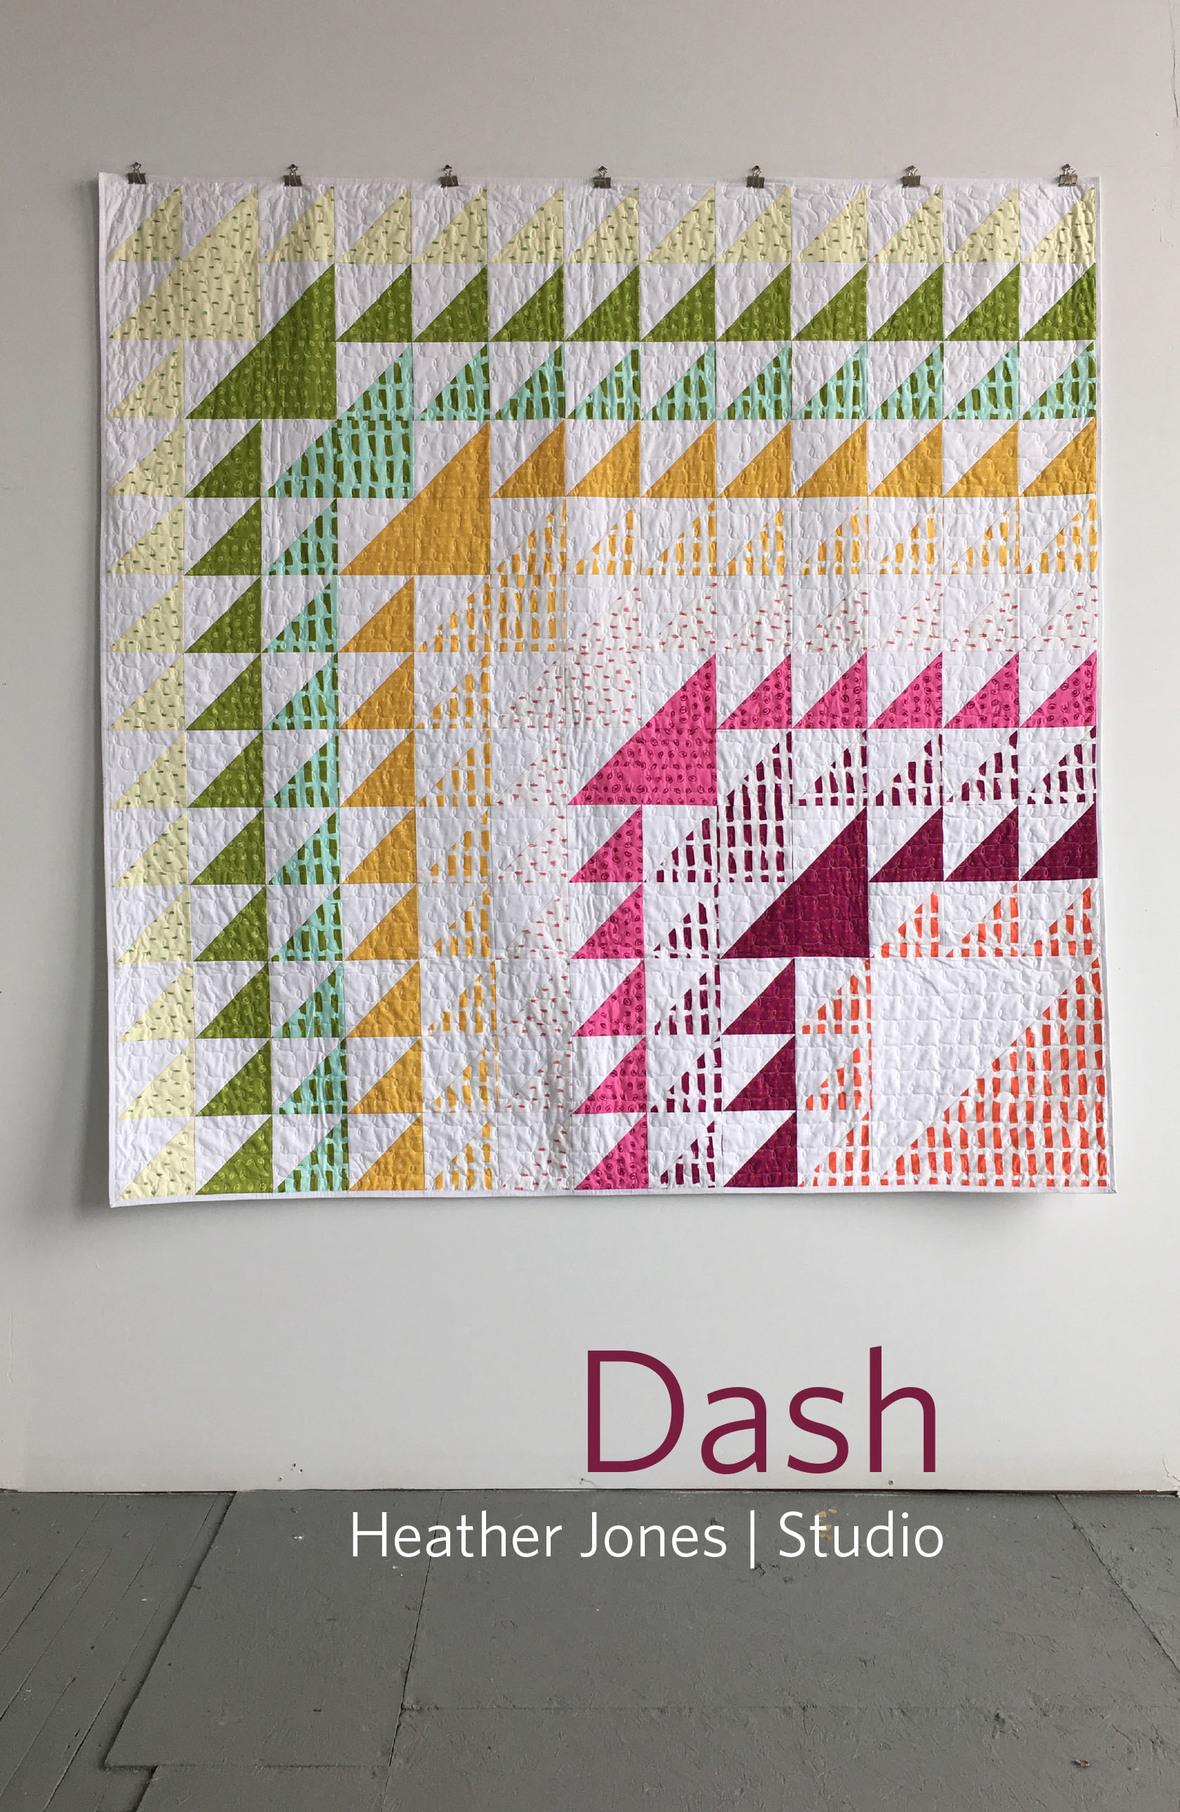 heather jones dash sewing pattern